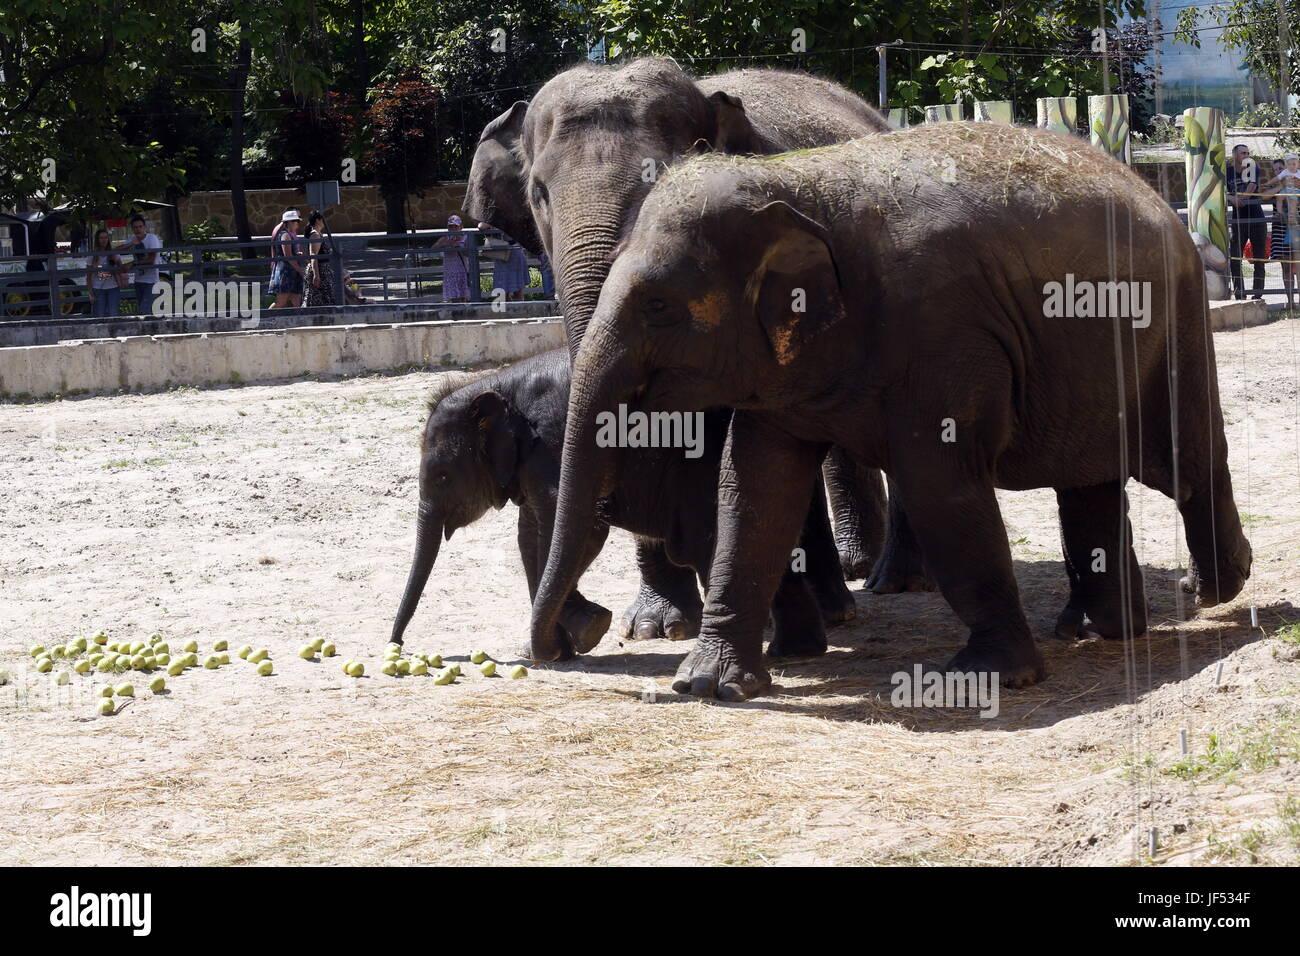 ROSTOV-ON-DON, RUSSIA – JUNE 28, 2017: Elephants at the Rostov-on-Don Zoo. Valery Matytsin/TASS - Stock Image